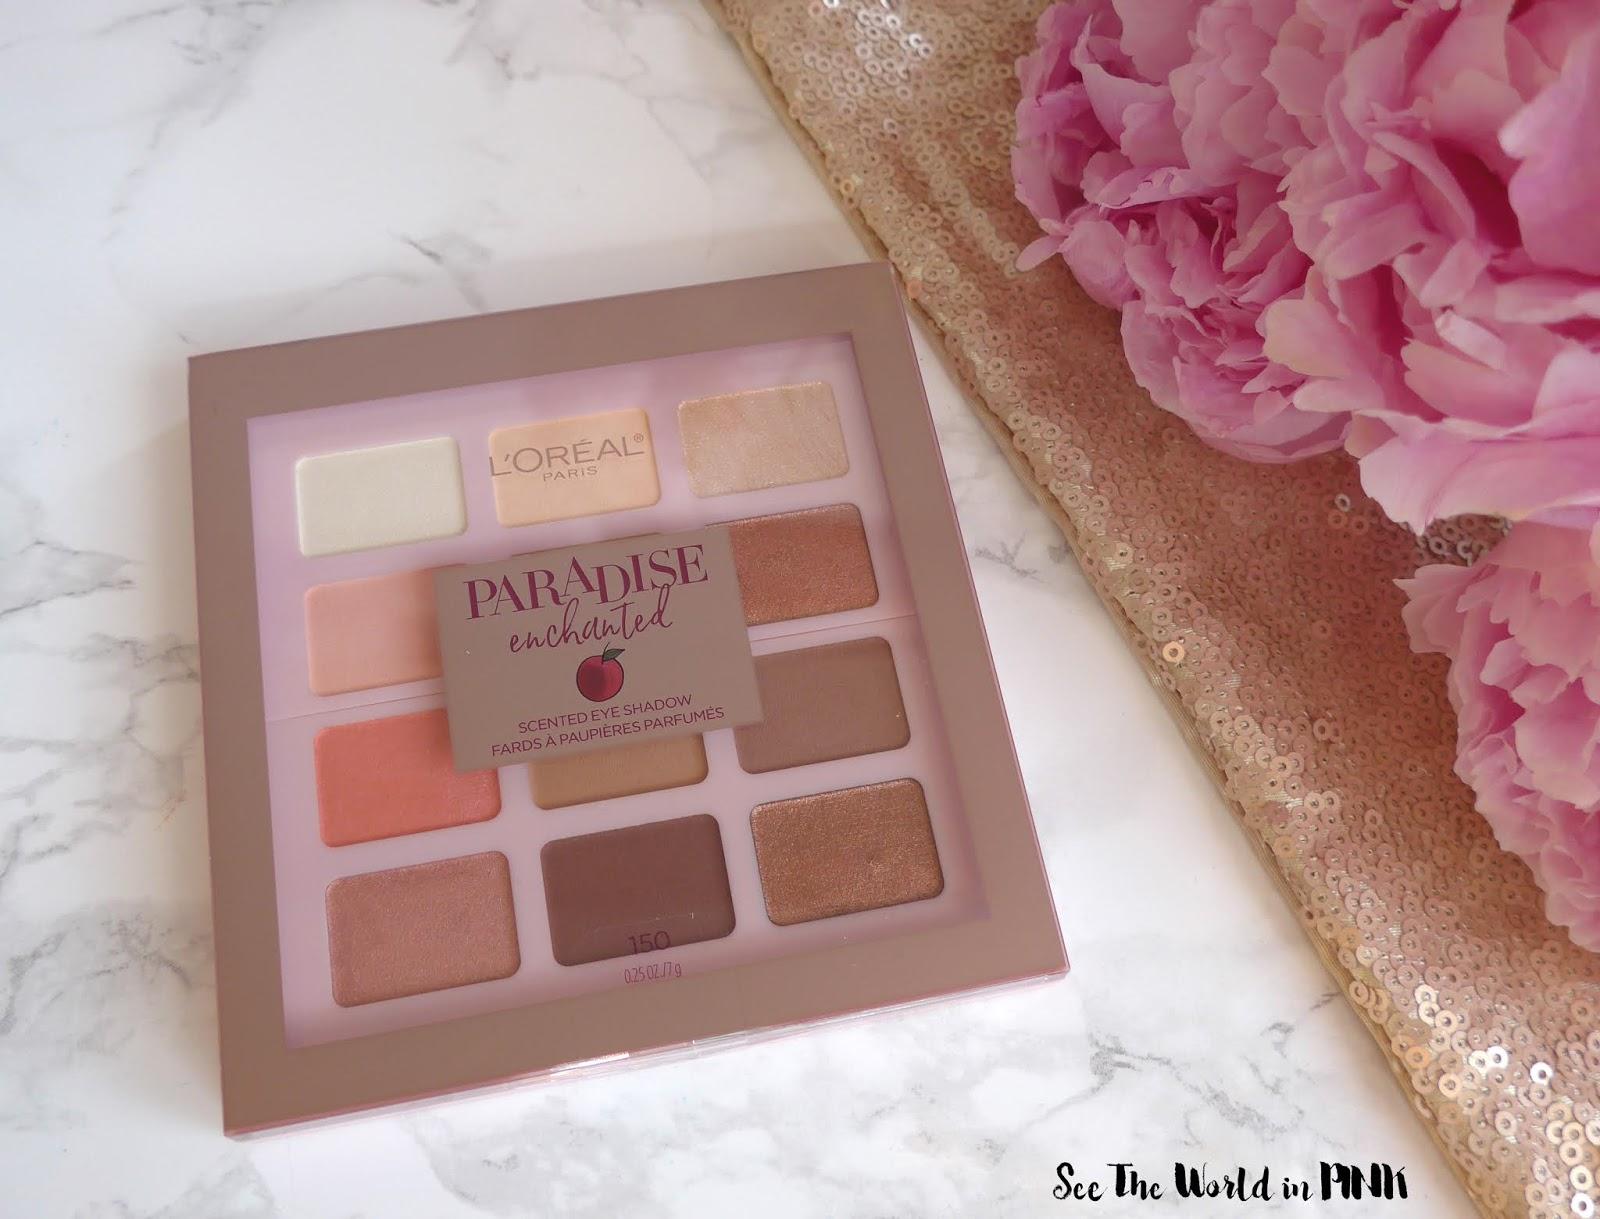 l'oreal paradise enchanted eyeshadow palette